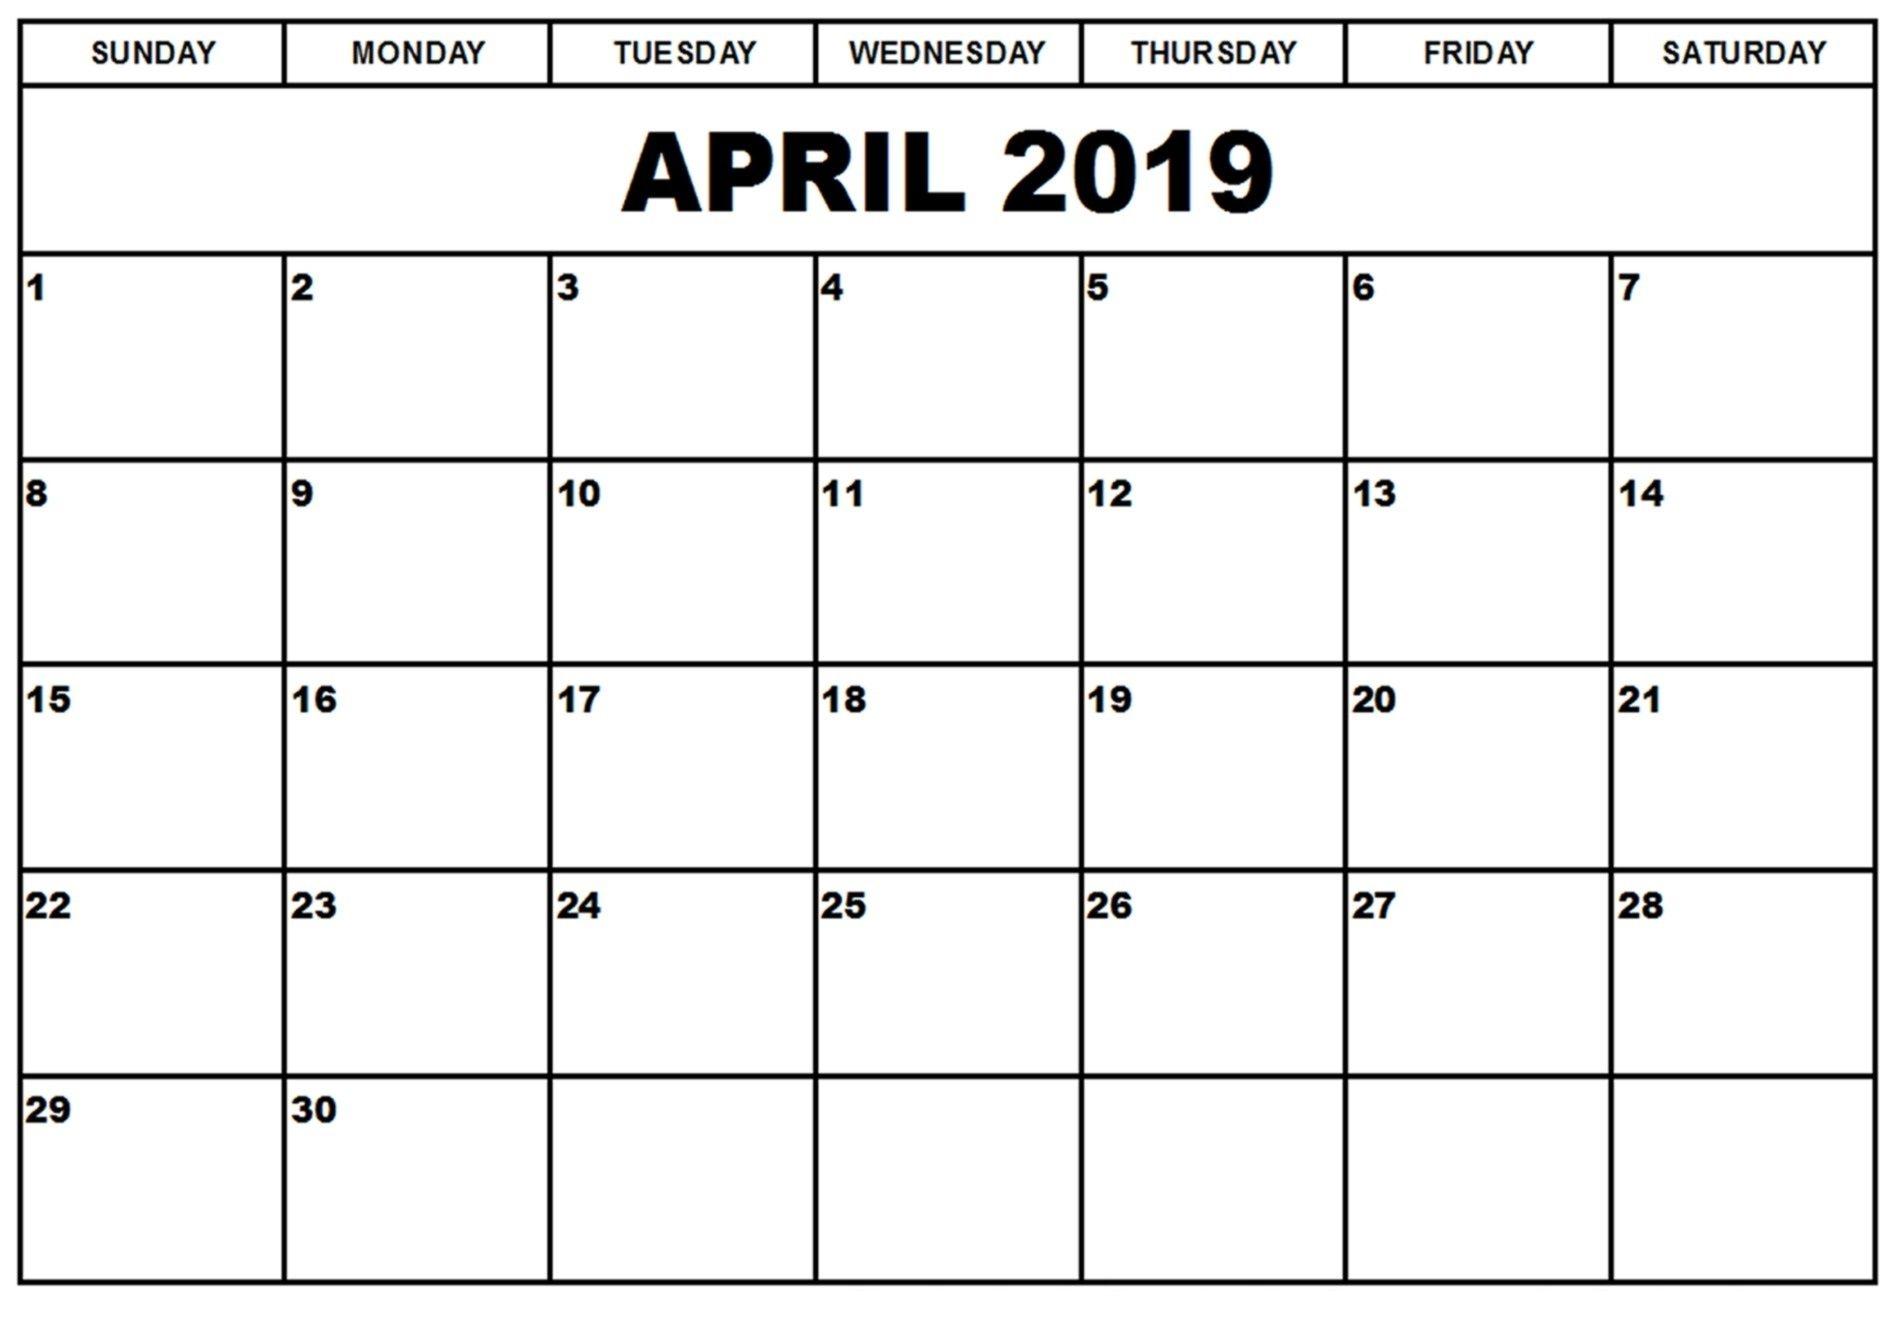 Calendar April 2019 Landscape